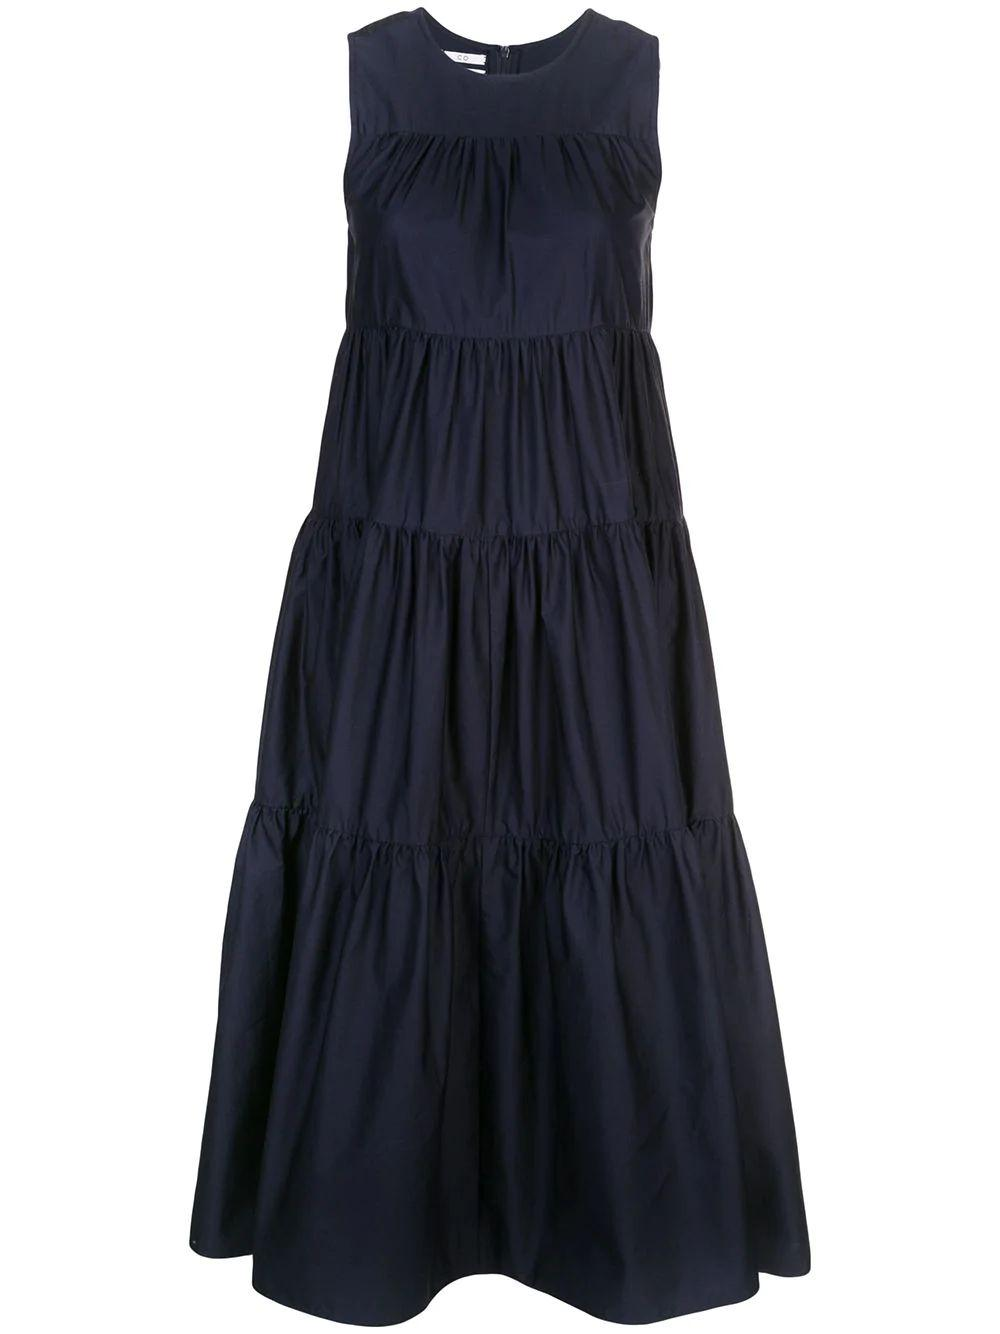 Sleeveless Tiered Dress Item # 4370STN-ESSN